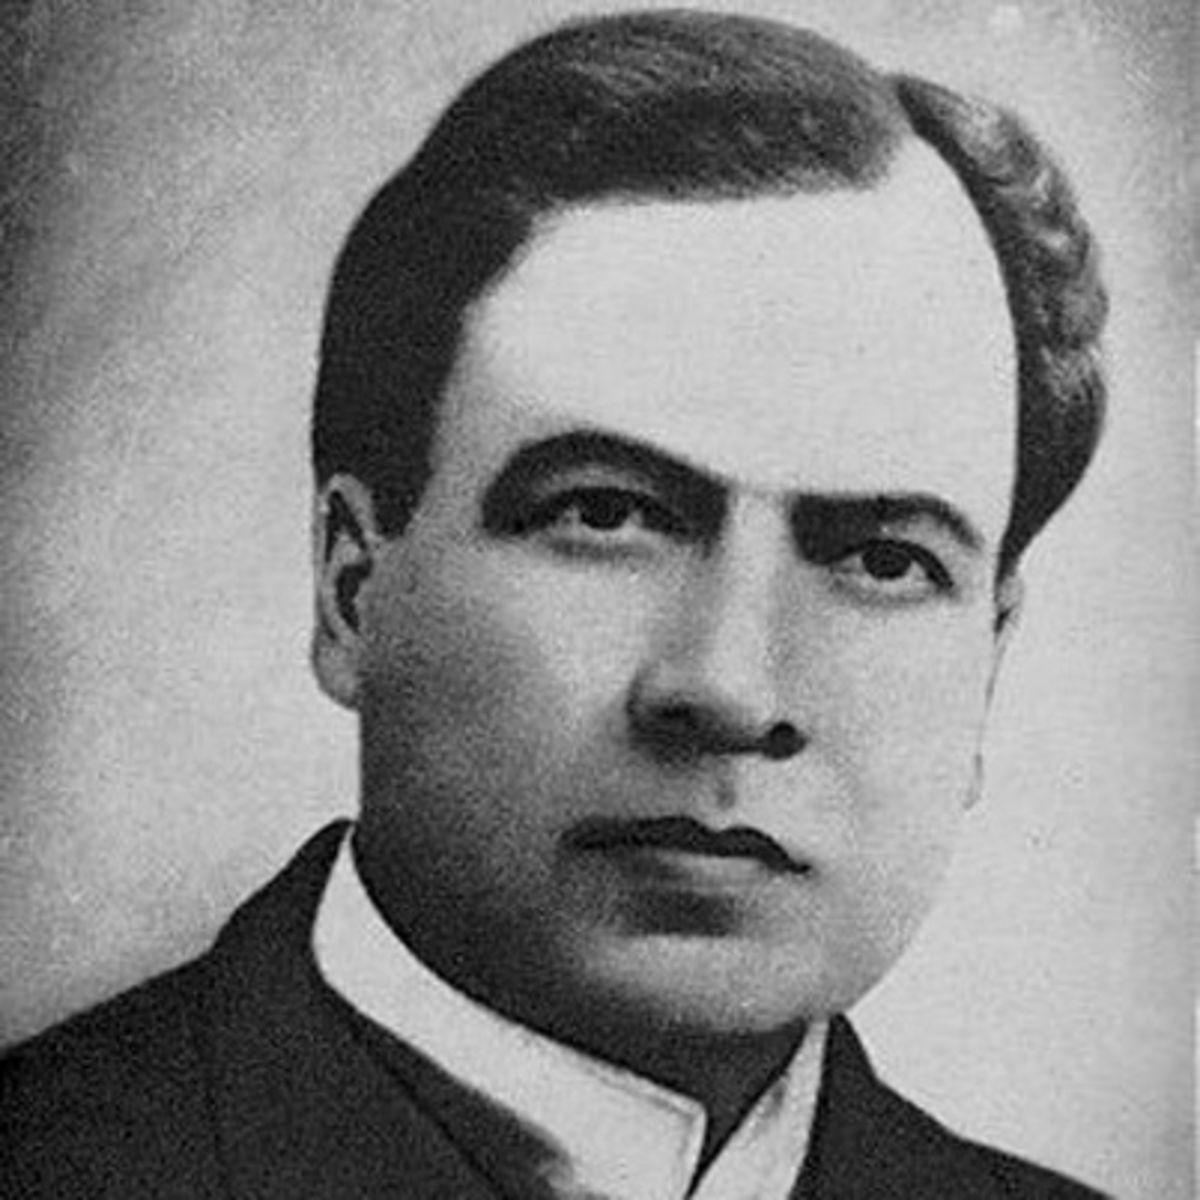 Poesia del giorno. Rubén Darío